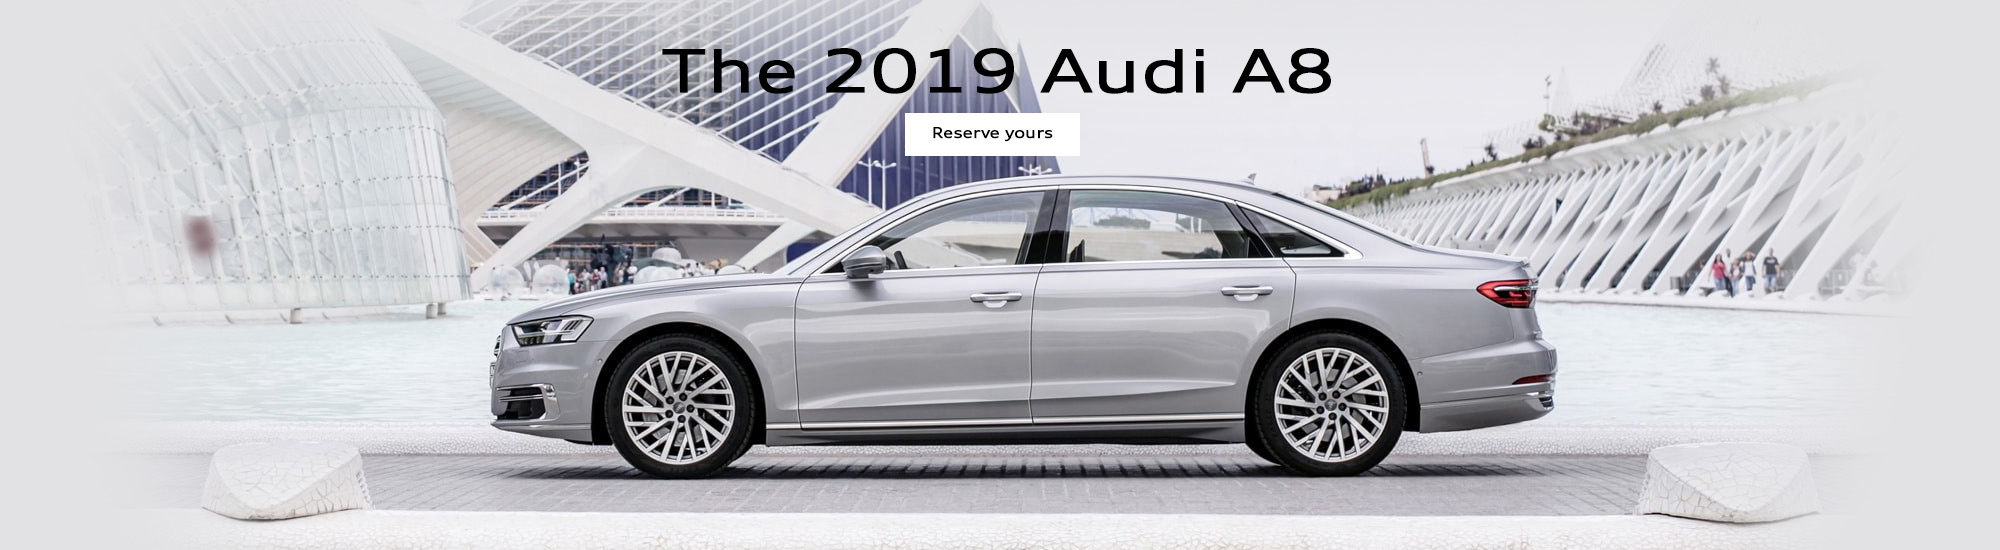 The 2019 Audi A8